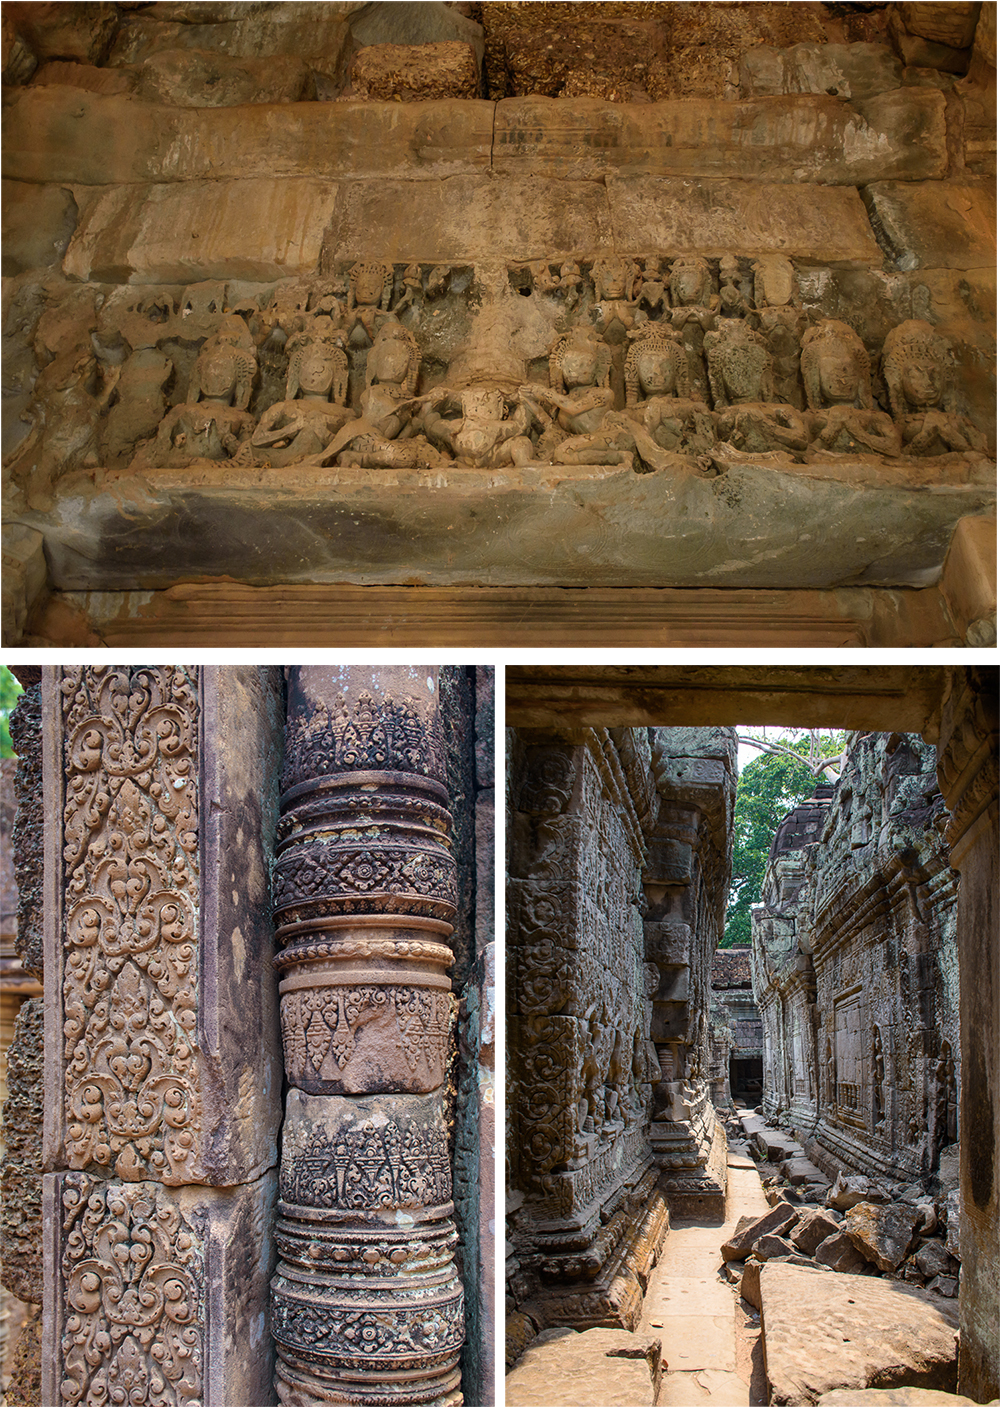 Banteay Sri, Banteay Samre, Preah Khan, Ta Som, and Neak Pean temple details